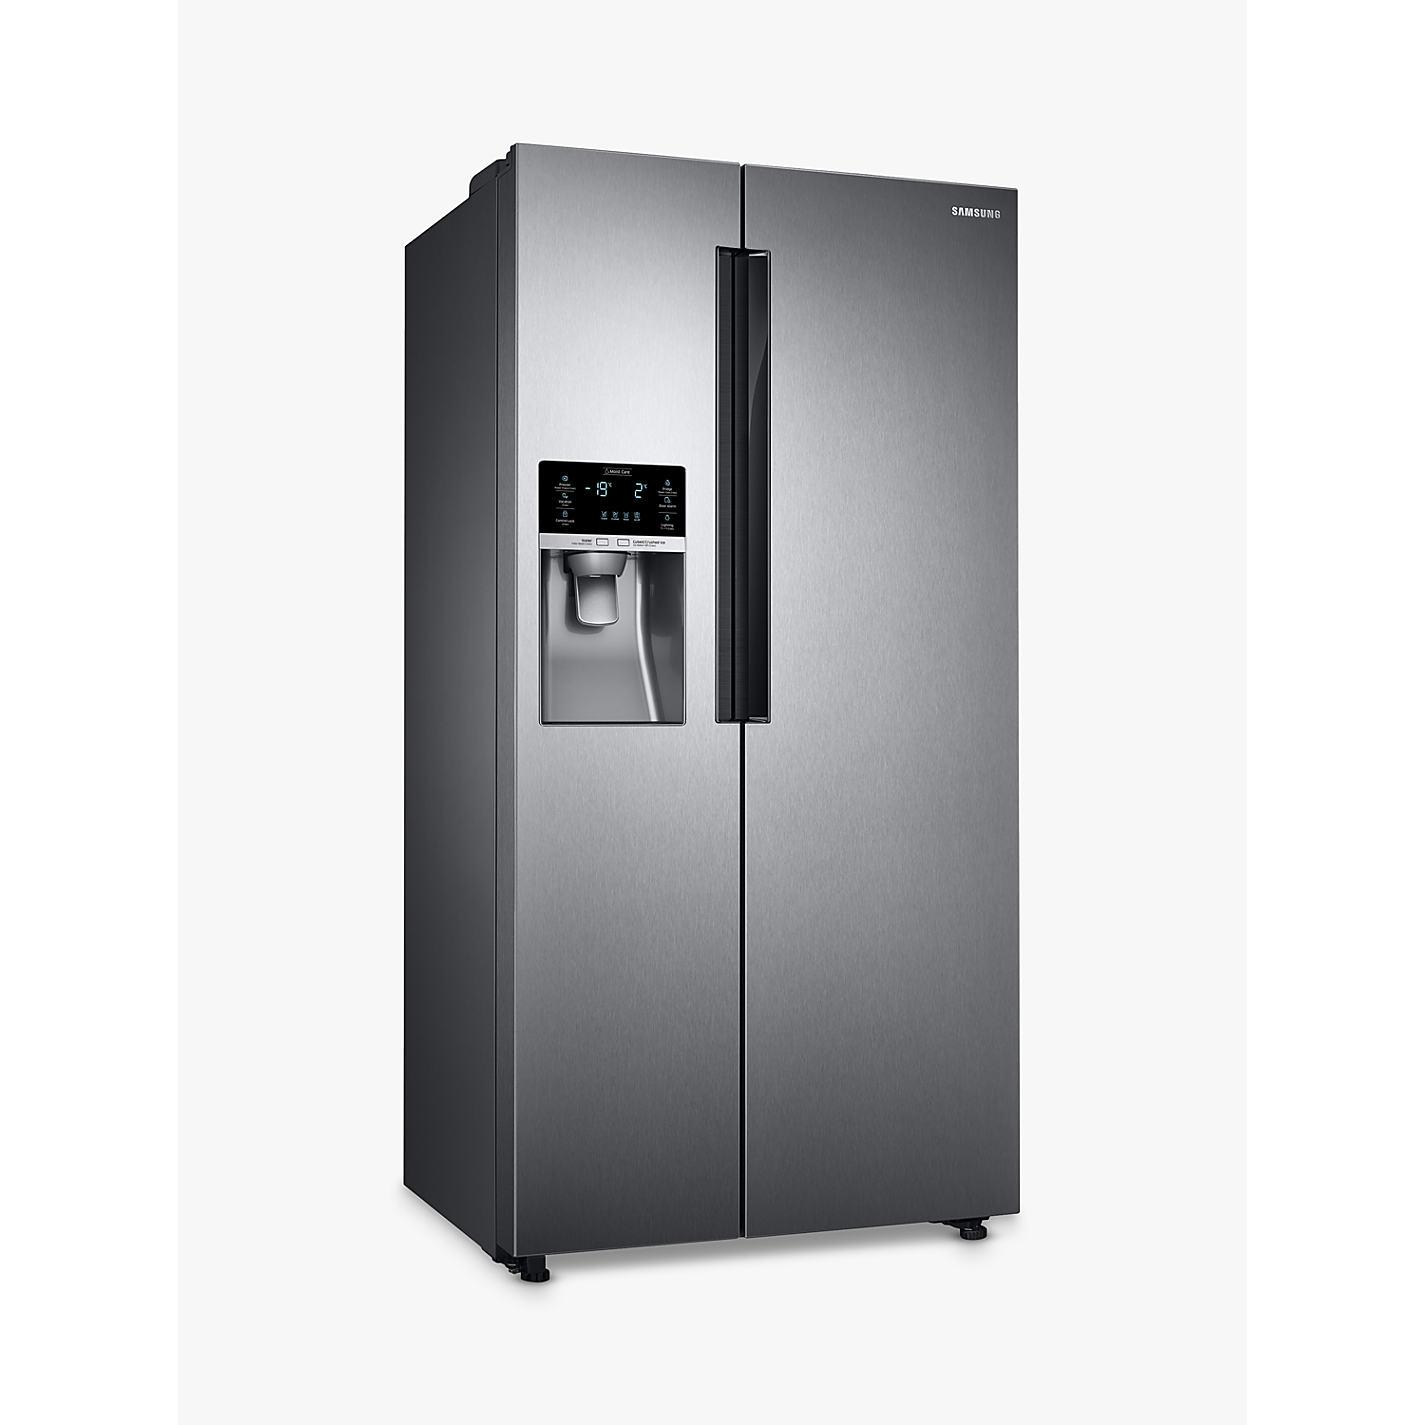 samsung american fridge freezer. buy samsung rs58k6387sl american style fridge freezer, a+ energy rating, 90cm width, silver freezer